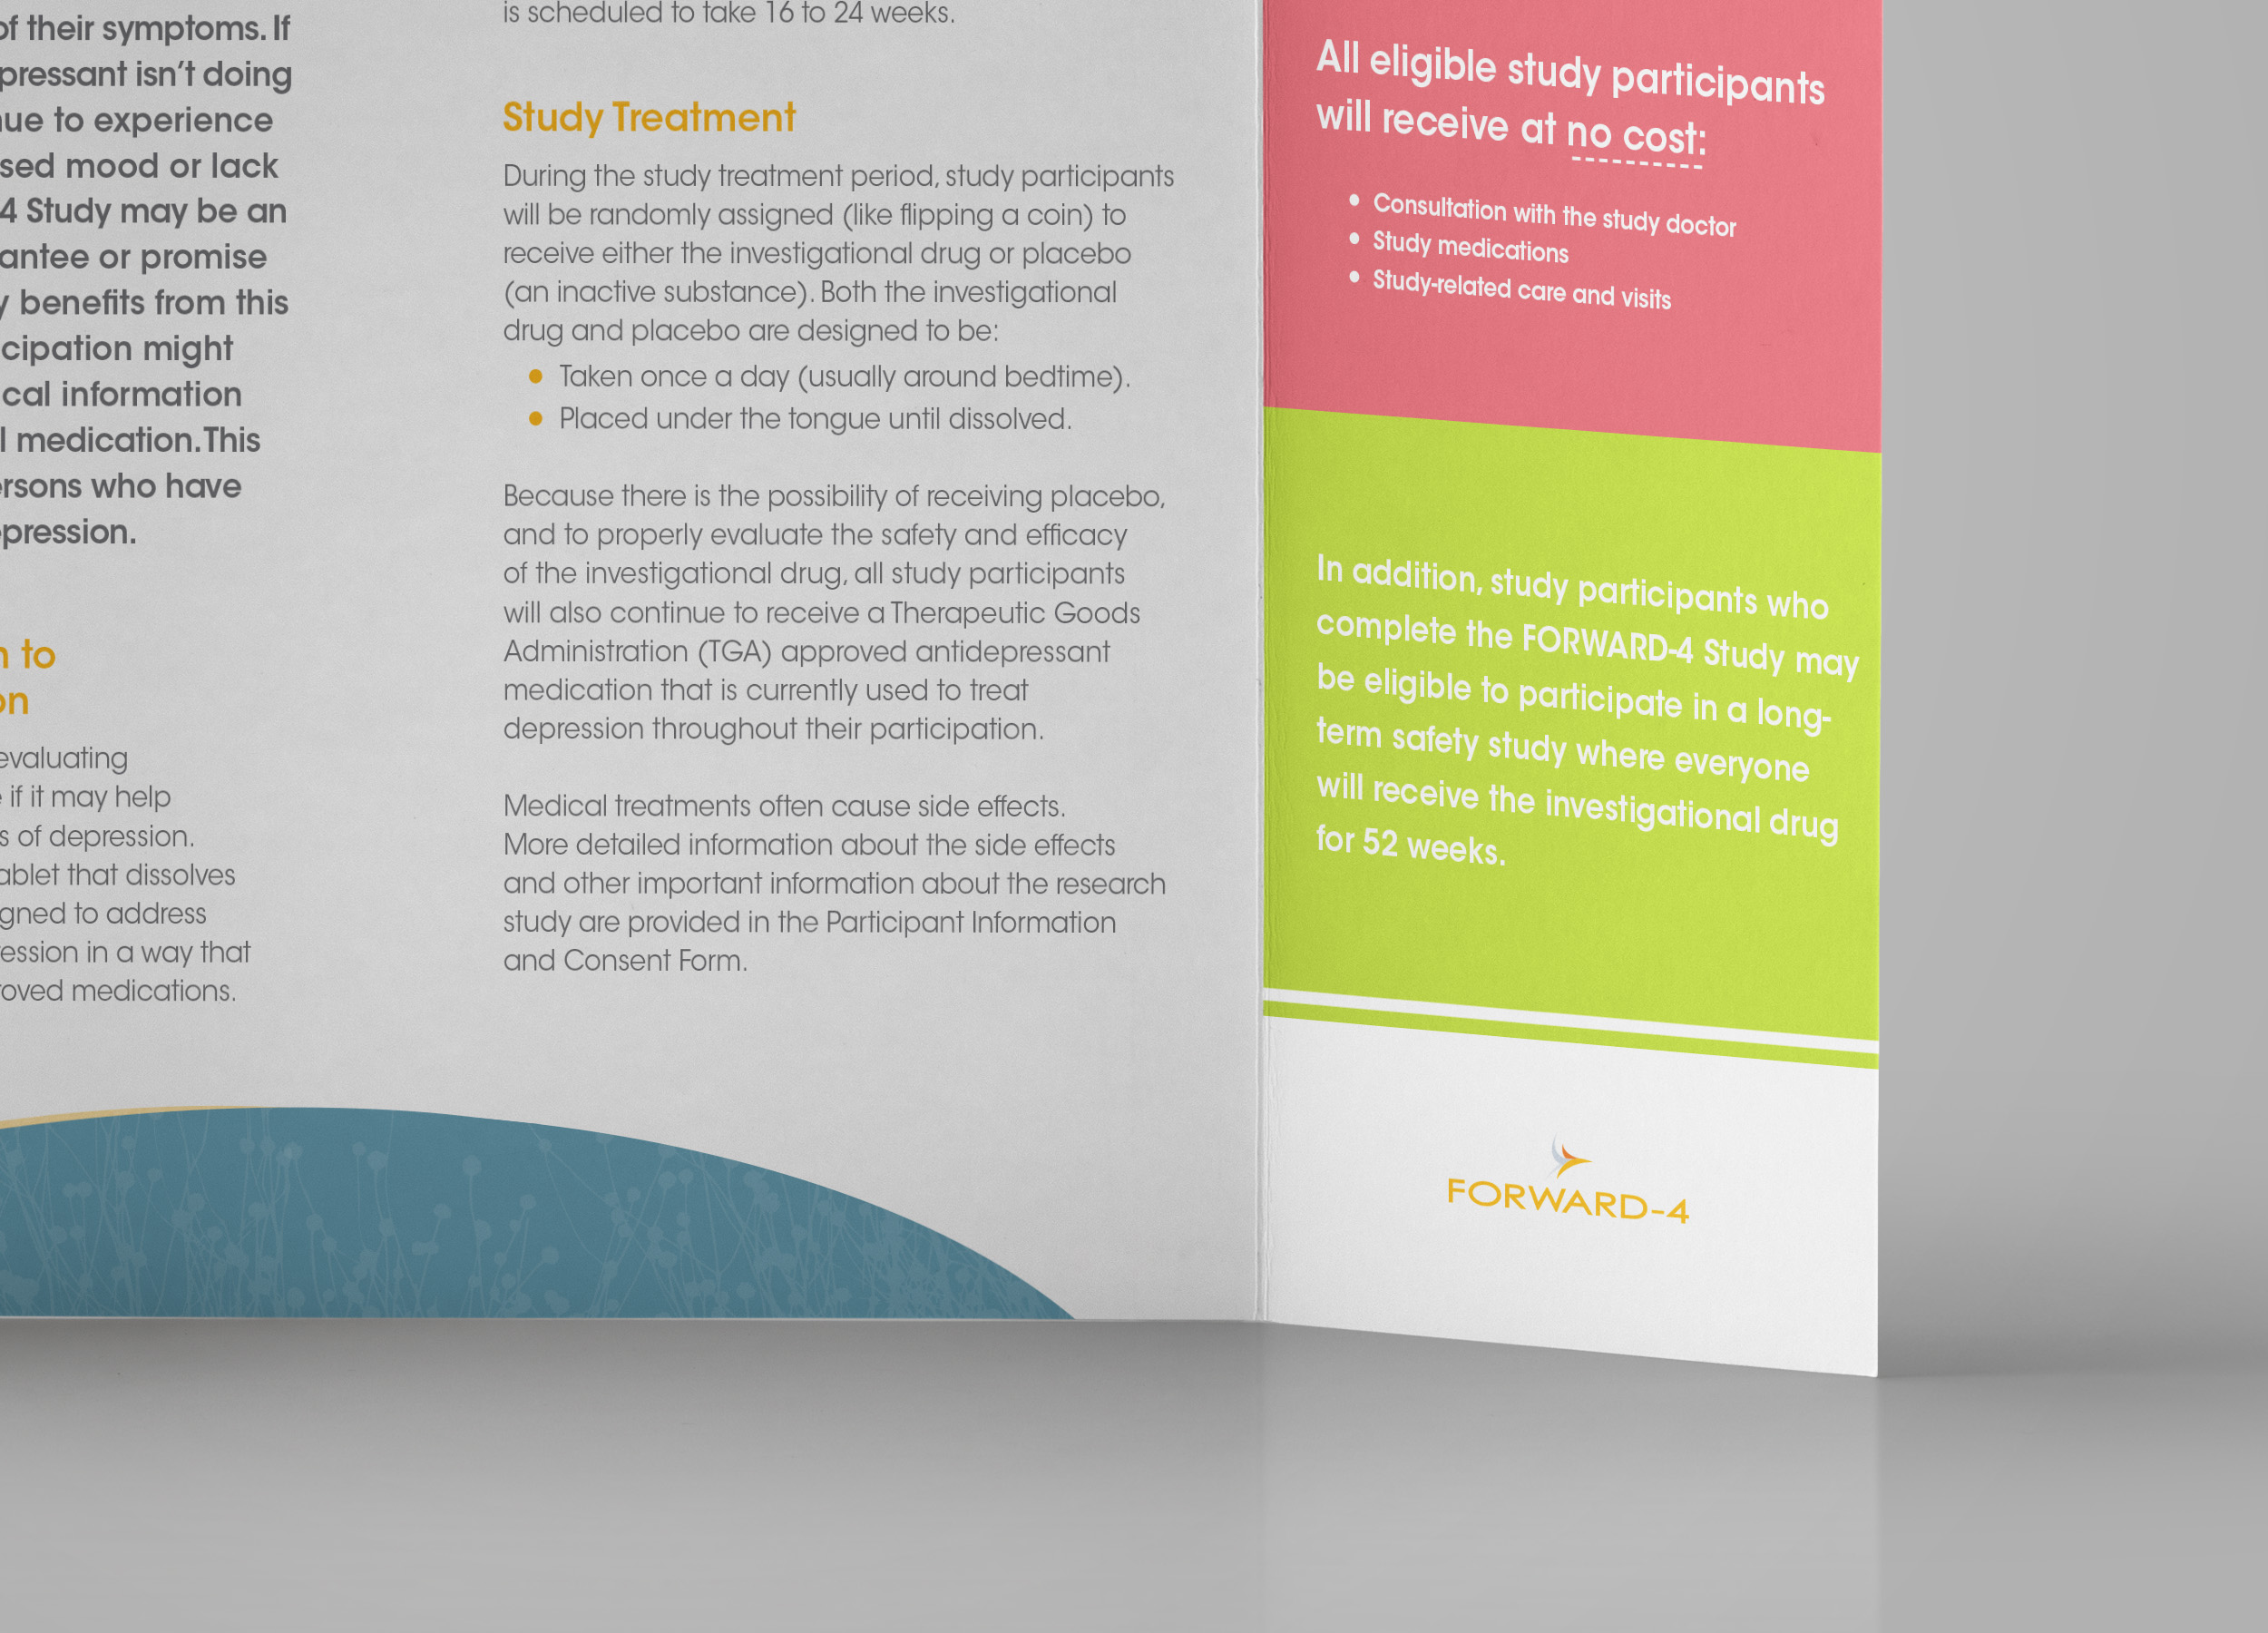 Forward Brochure